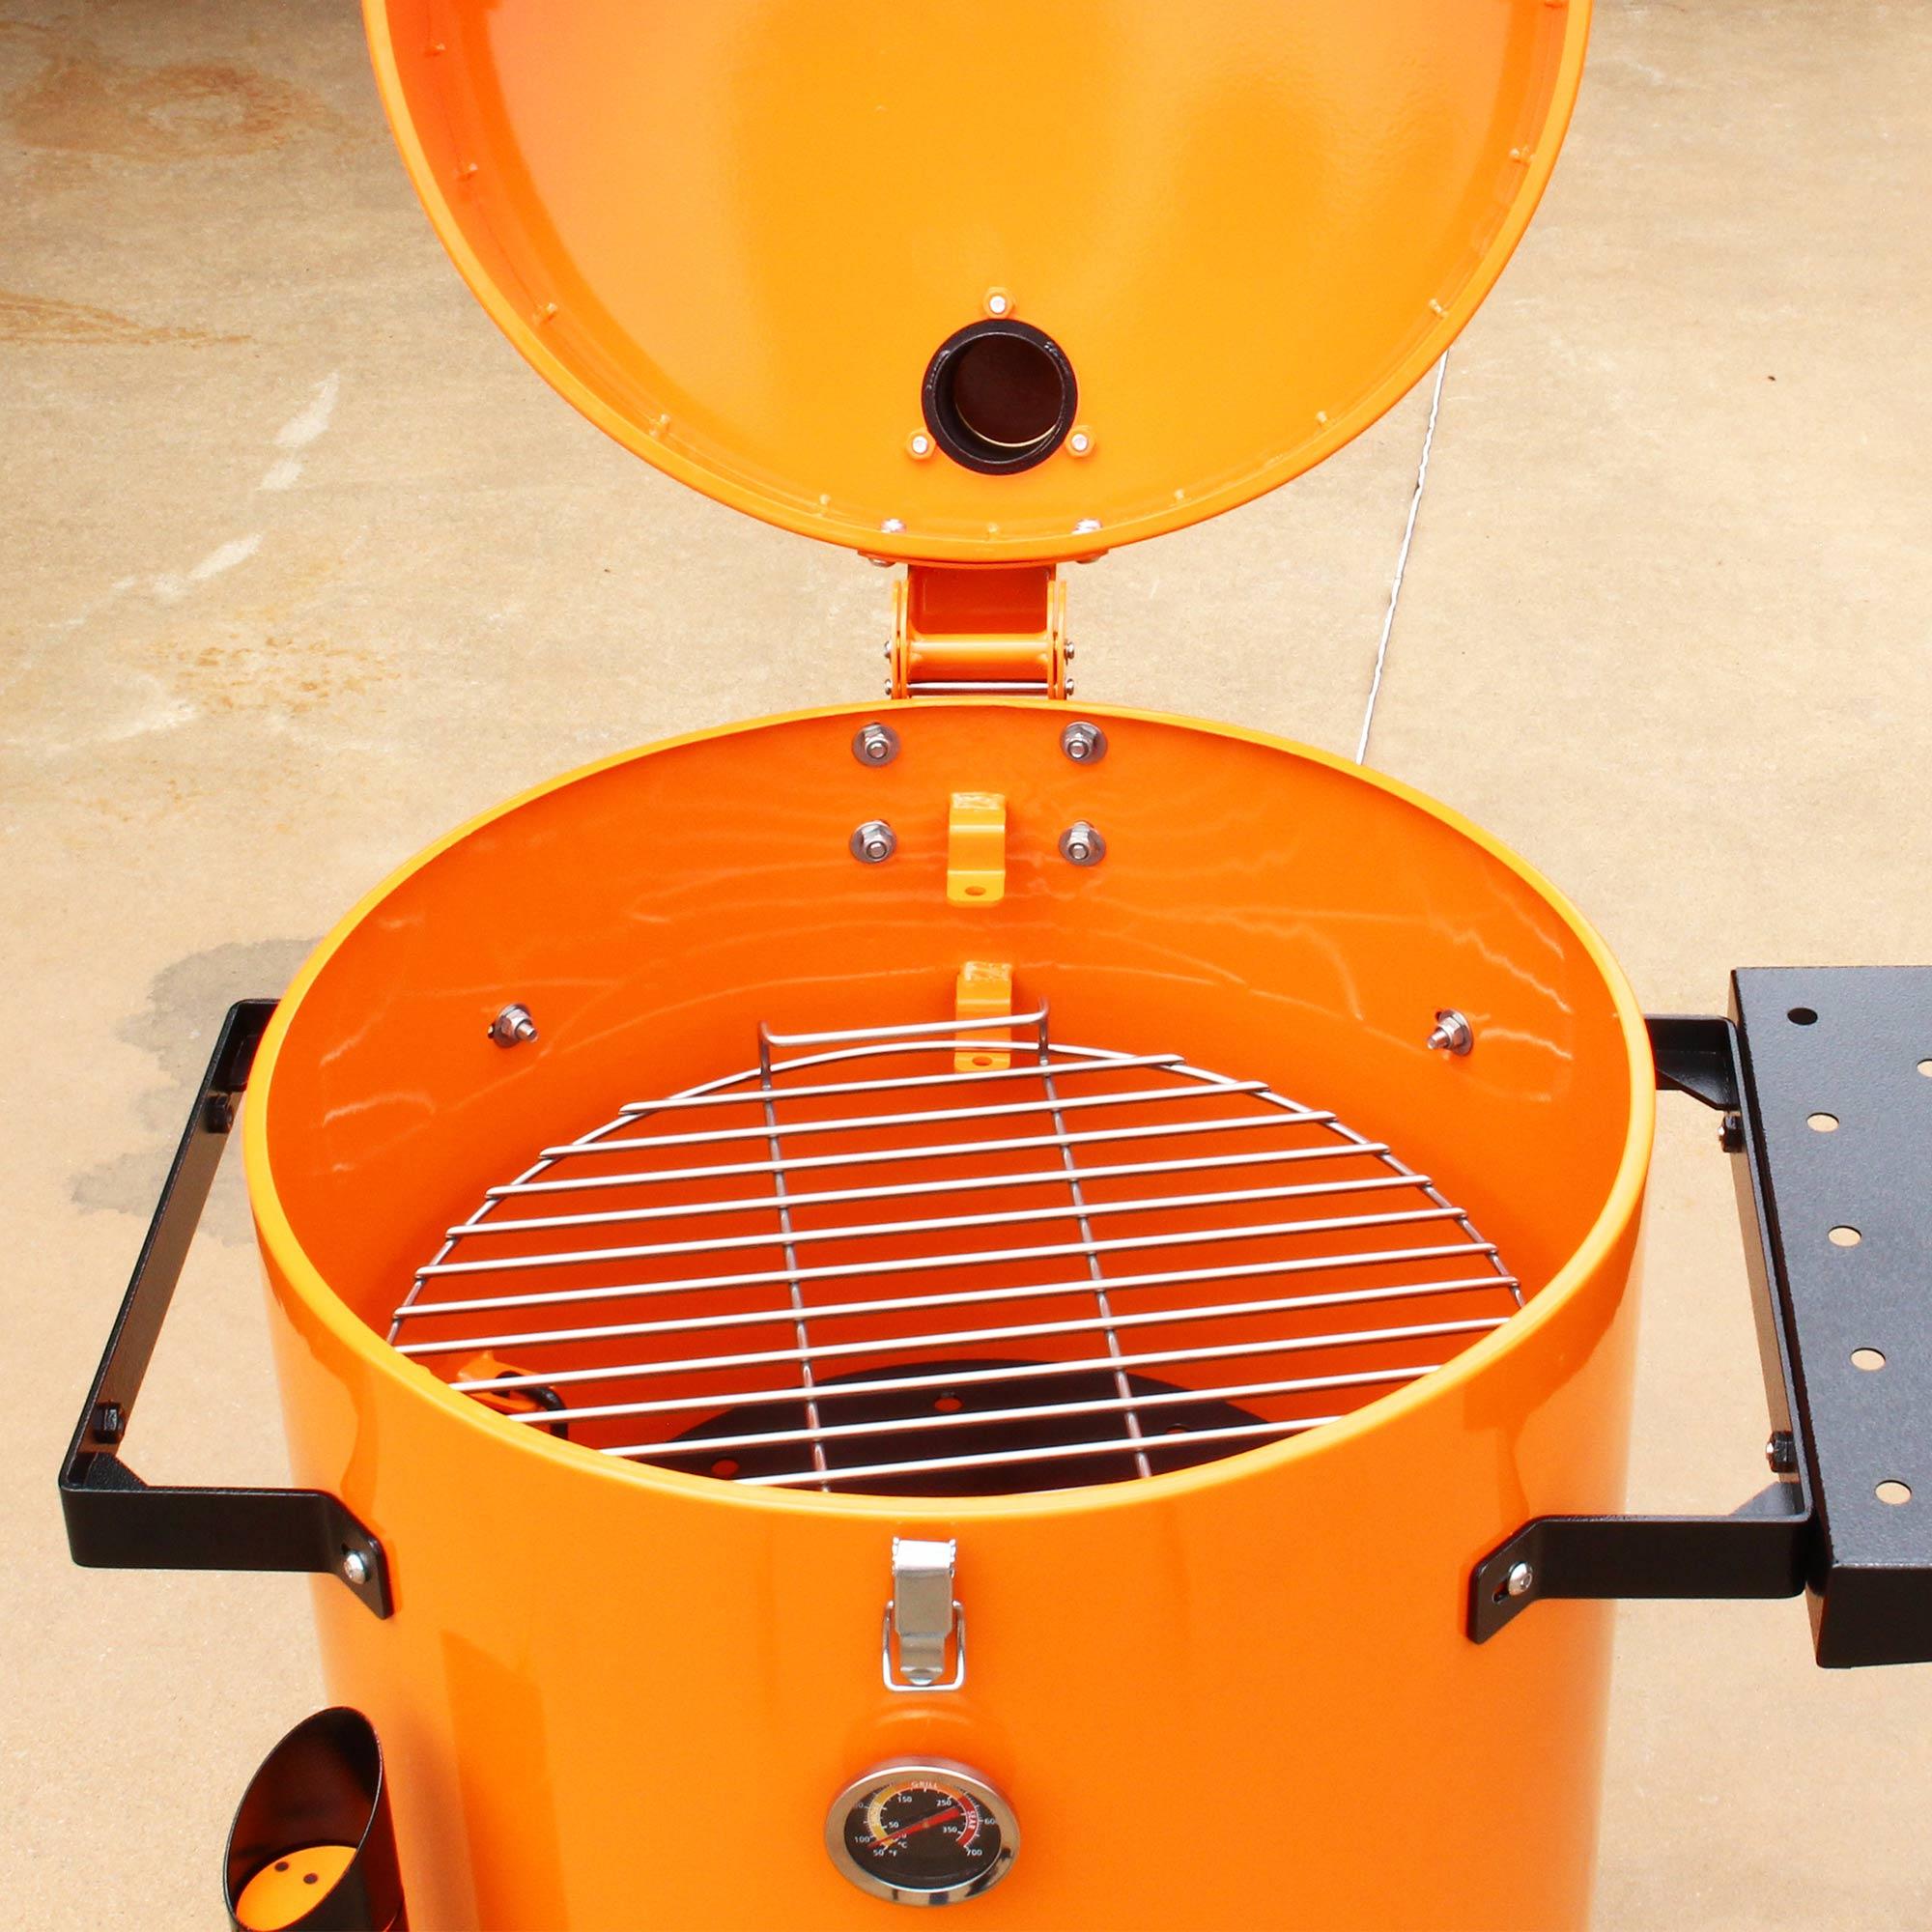 Grillex Drum Smoker Laranja/Preto